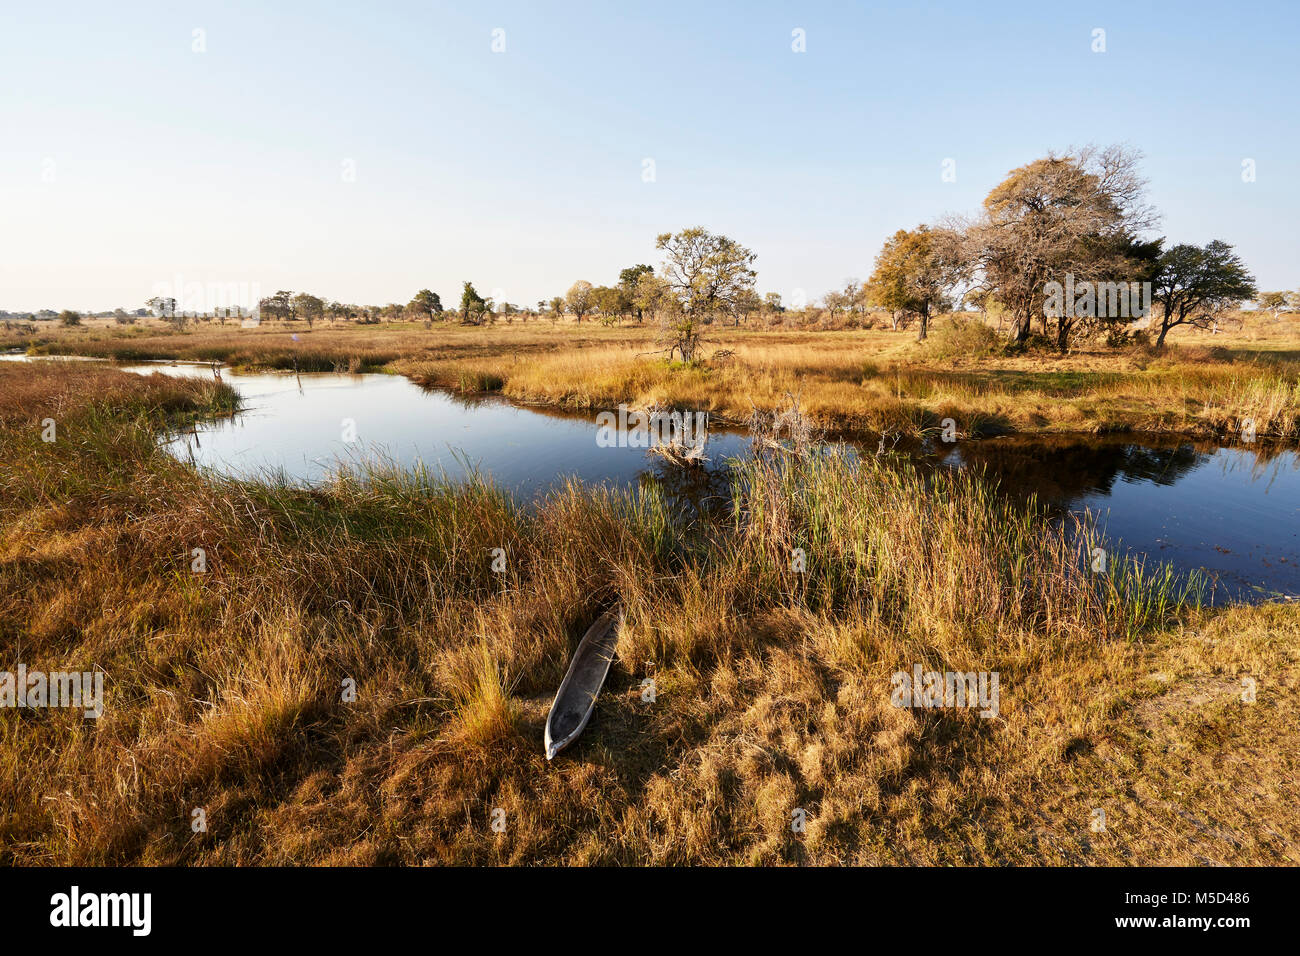 Fishing boat on the banks of the Kwando River, Bwabwata National Park, Zambezi Region, Caprivi Strip, Namibia - Stock Image